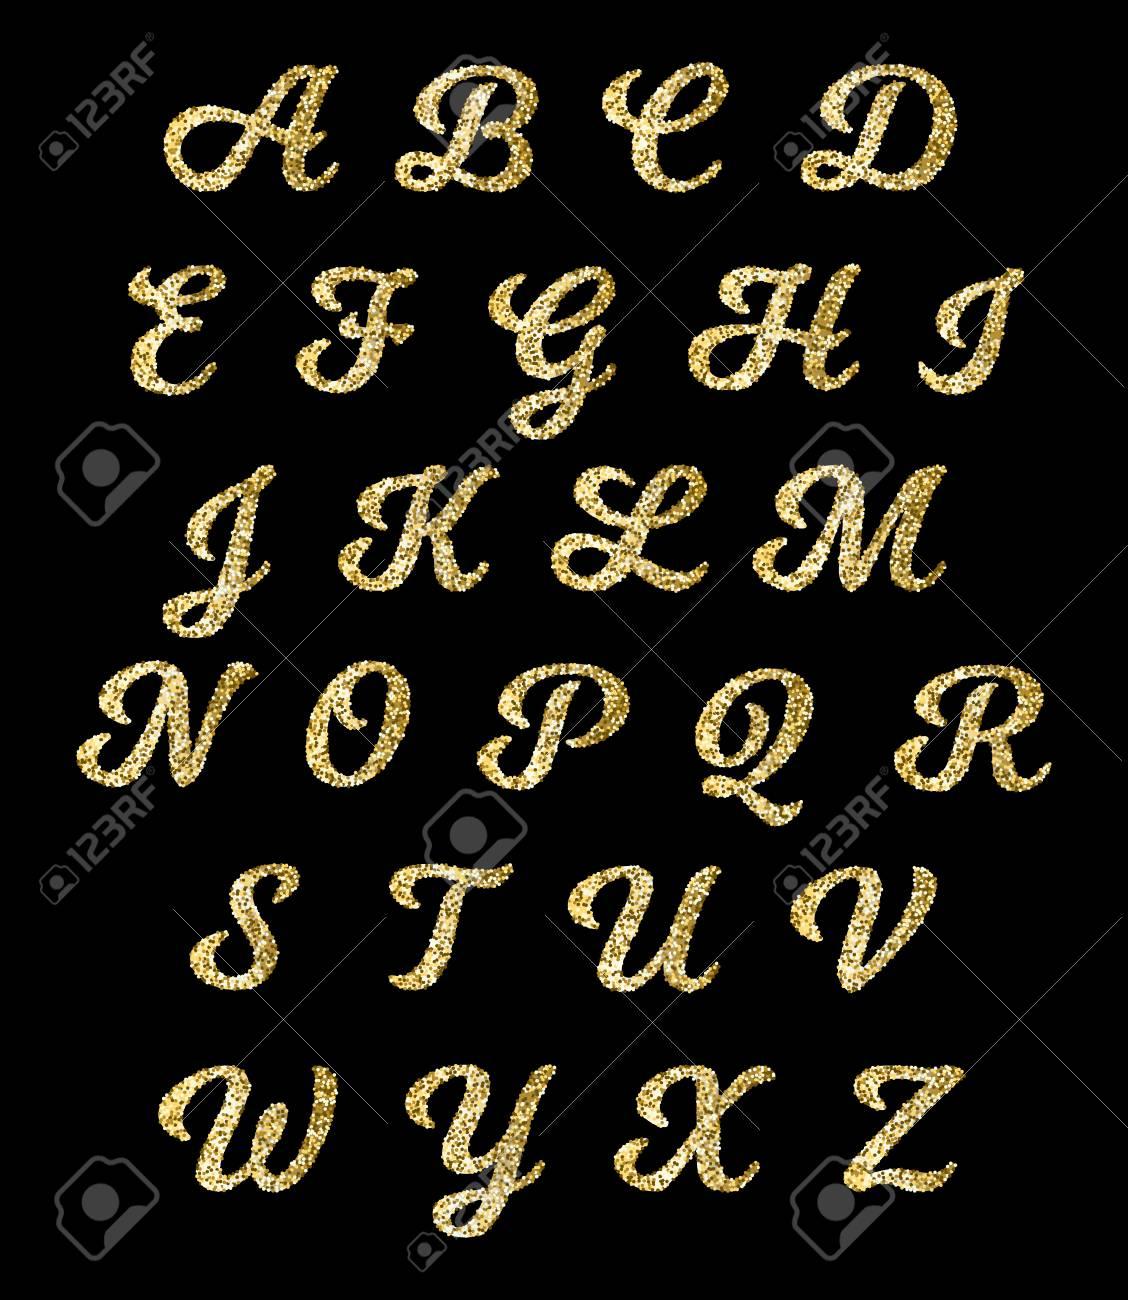 Golden glitter alphabet, gold font vector letters with sparkle